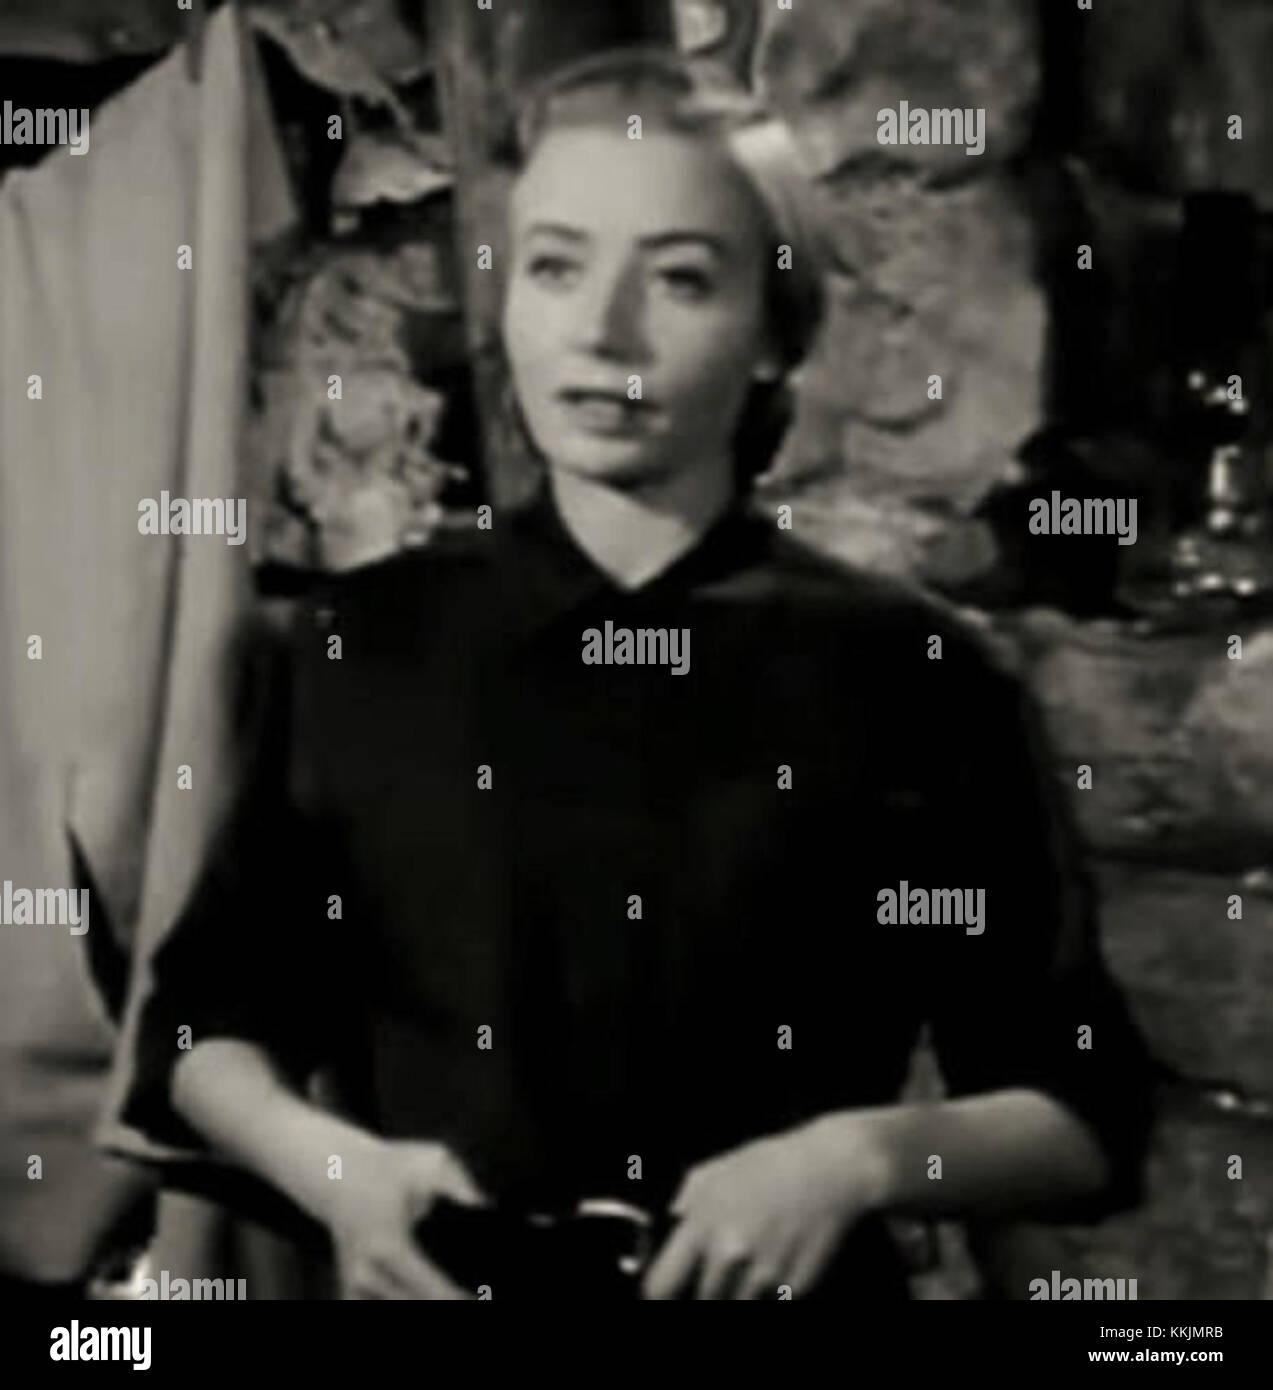 Emma Lung,Beryl Nesbitt Adult fotos Toby Stephens (born 1969),Hannah Alligood